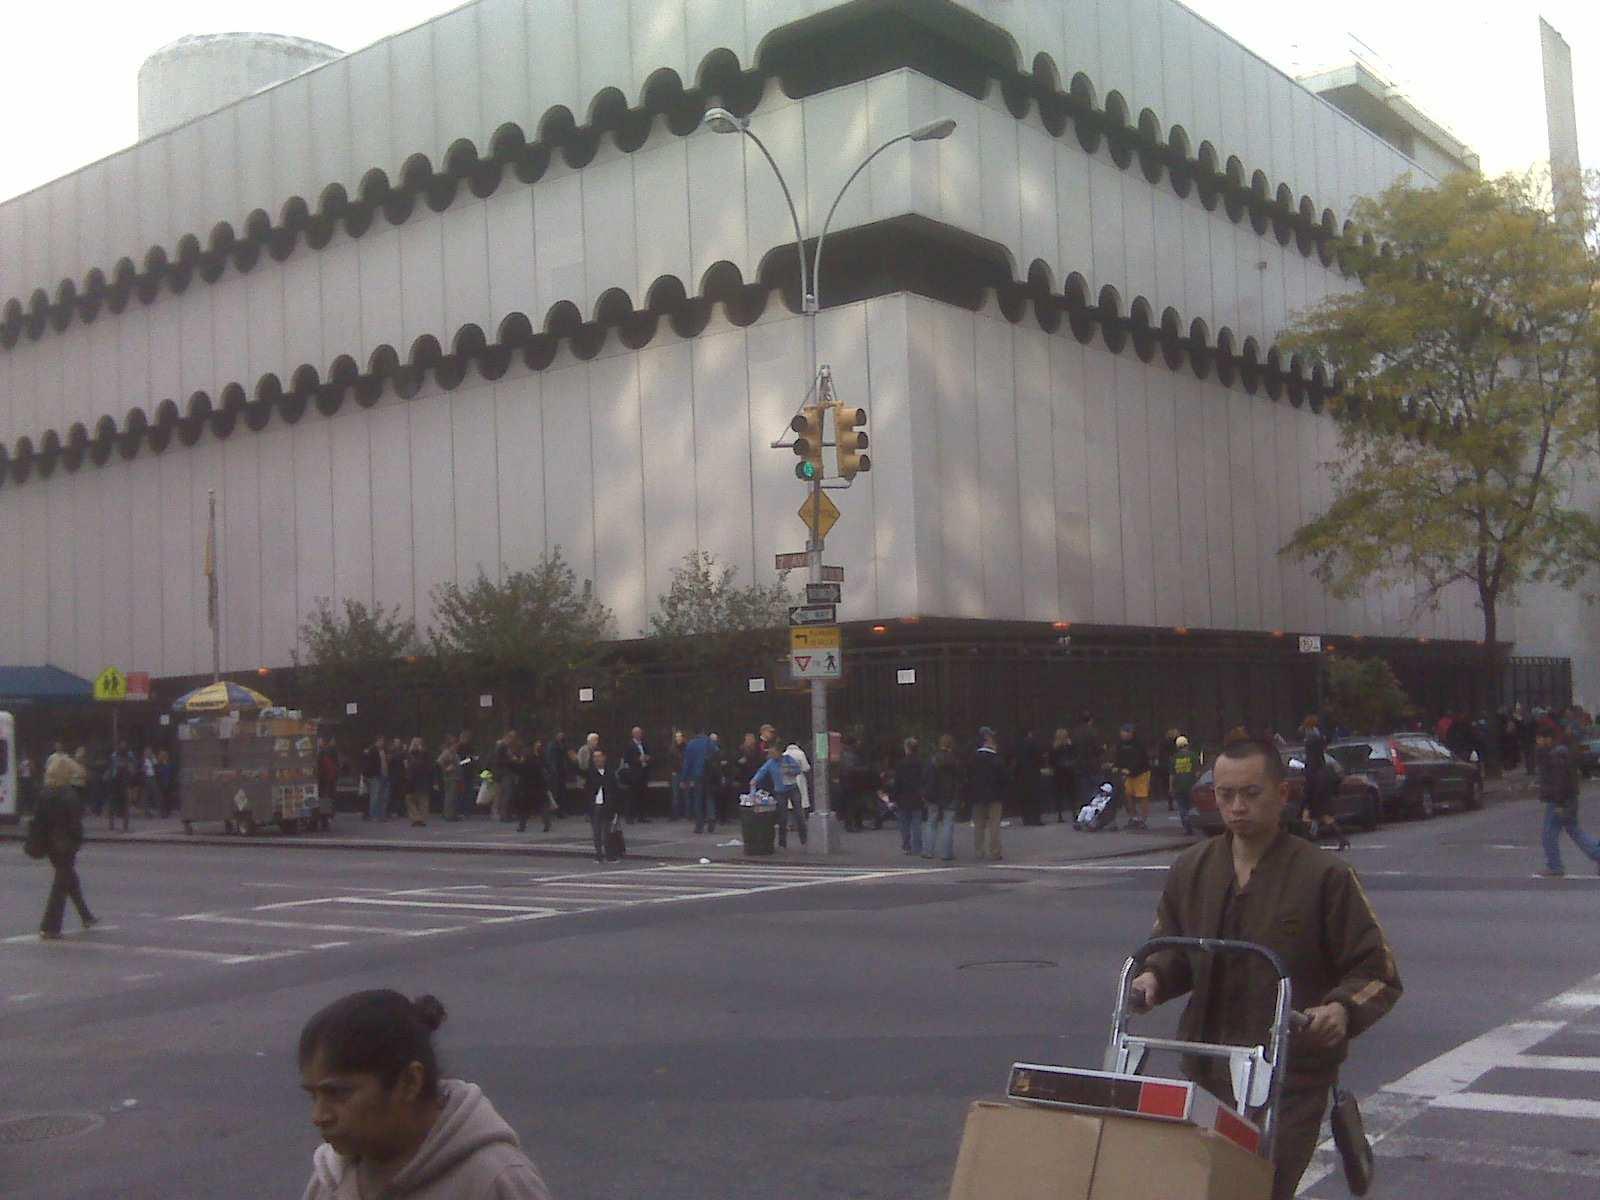 manhattan on 13th street